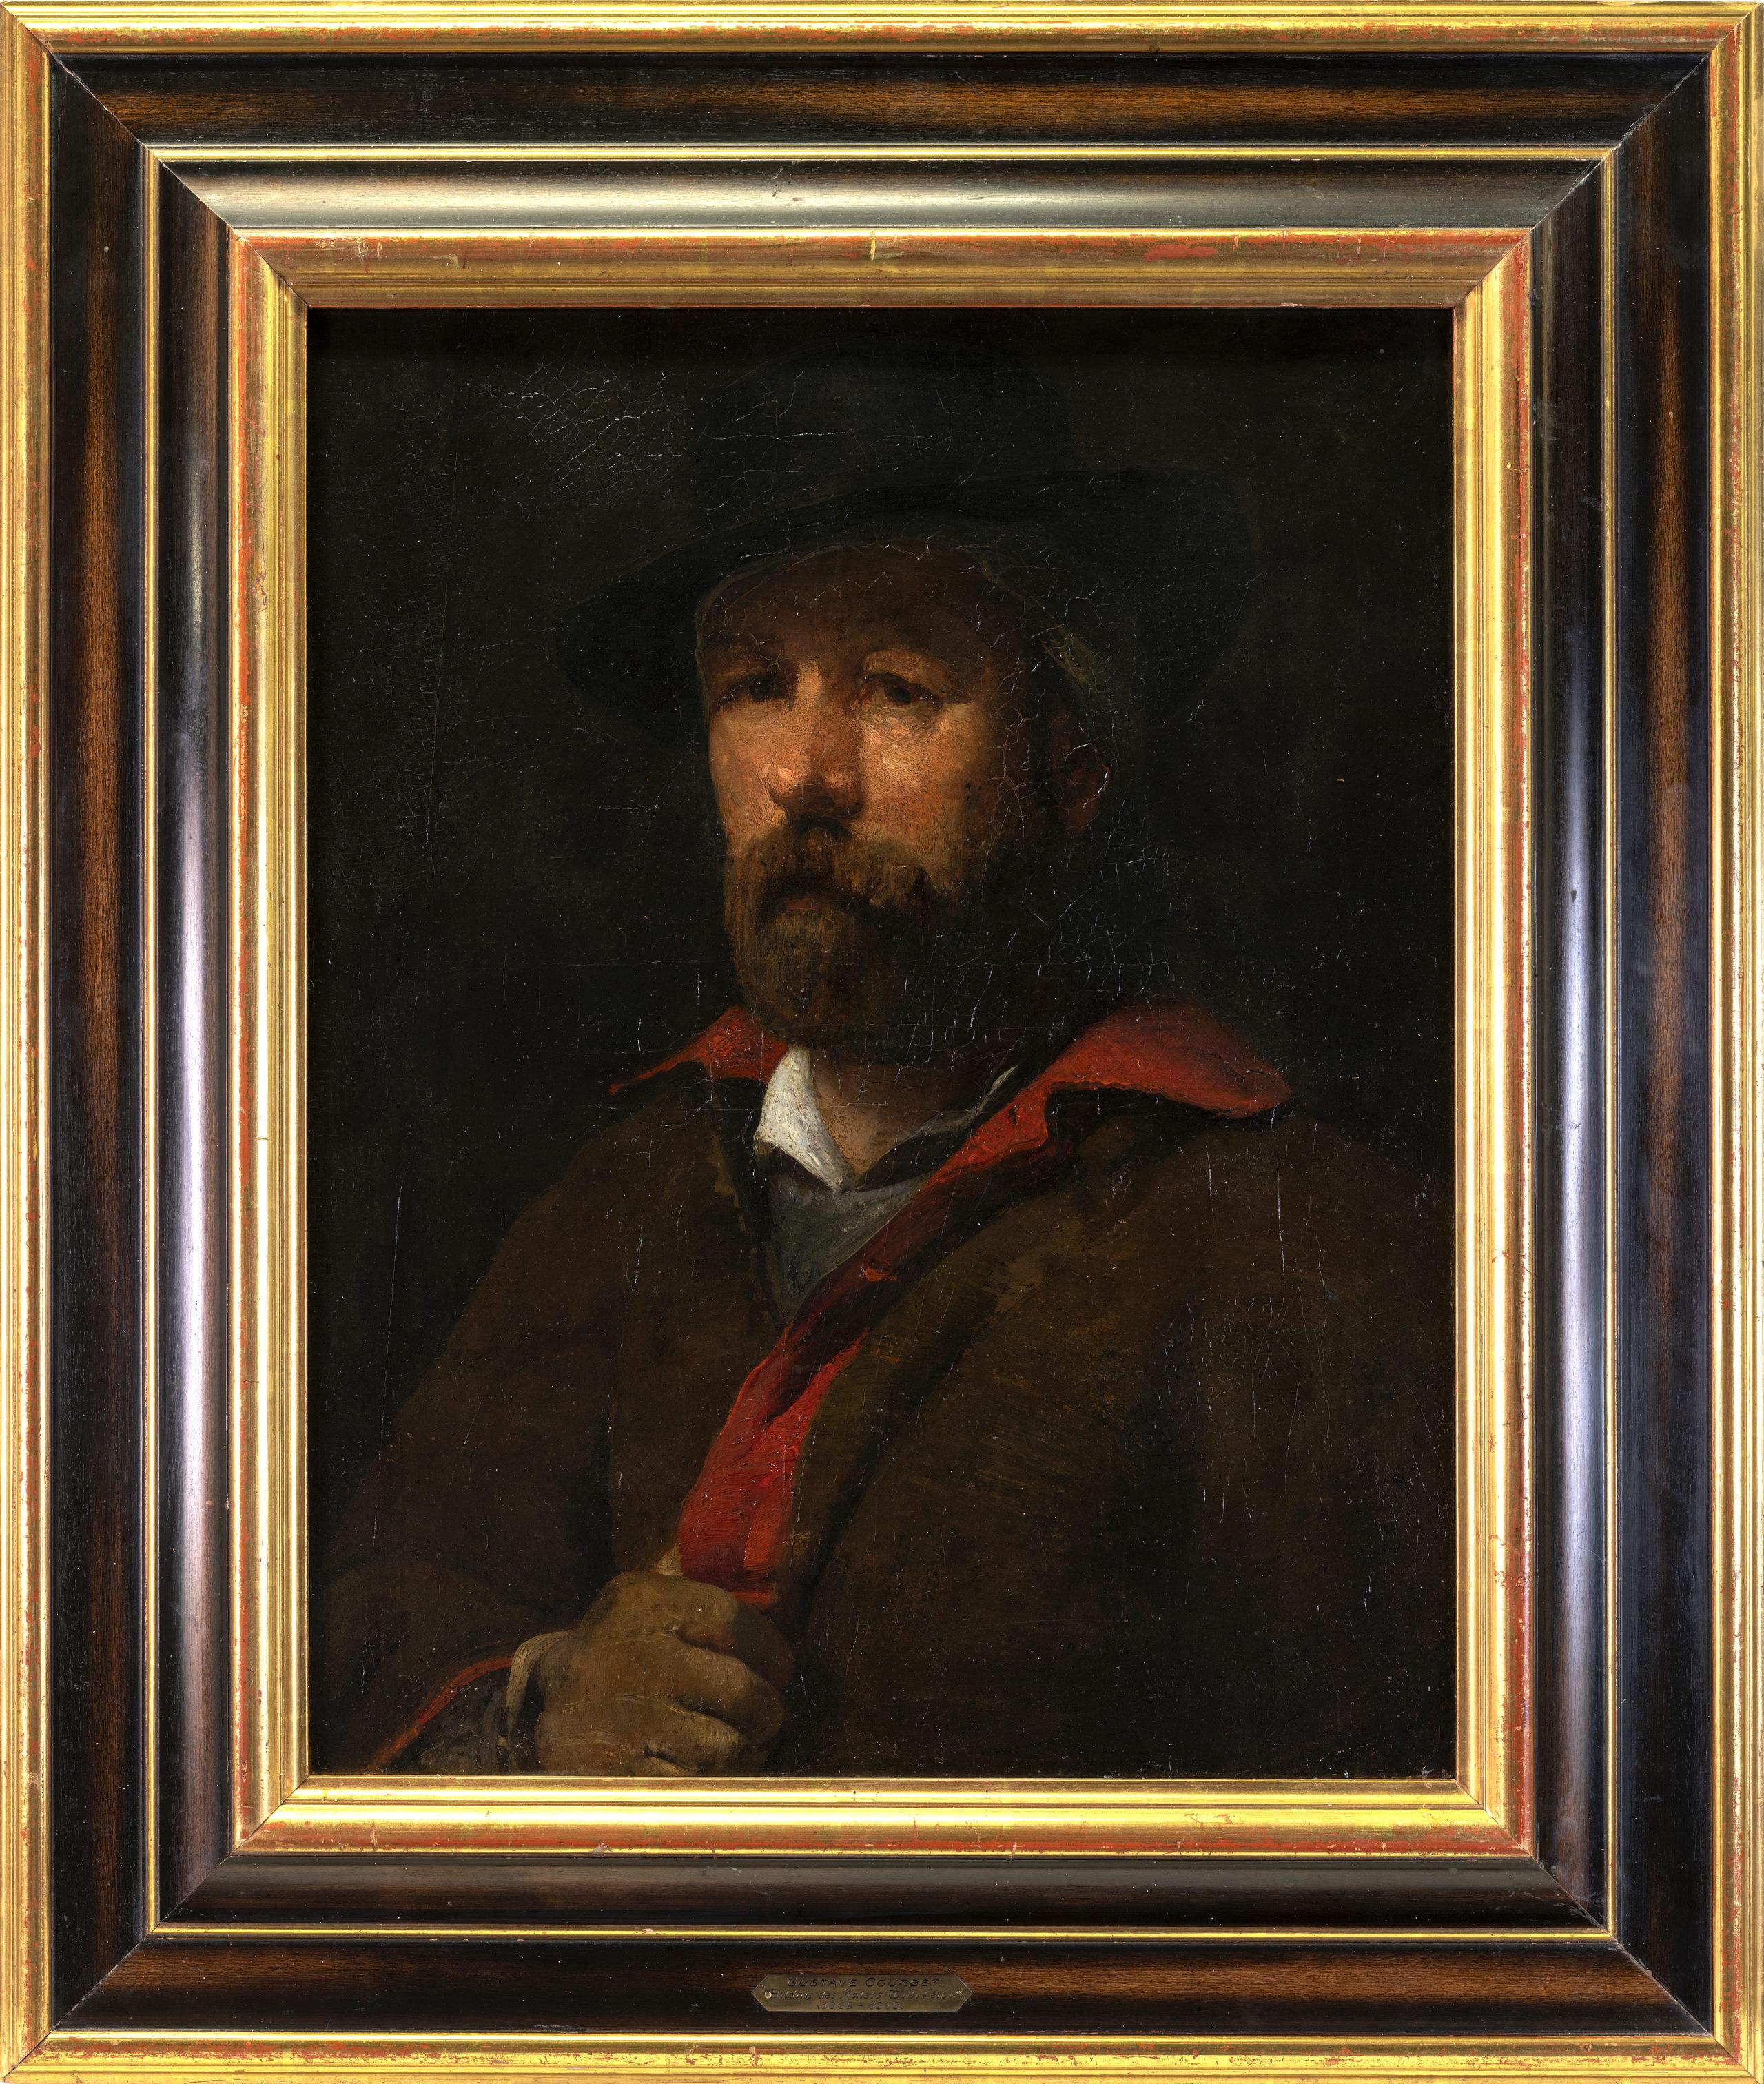 Portrait du peintre Wilhelm Leibl, 1869-1870. © Musée Jenisch Vevey. Photos: Julien Gremaud